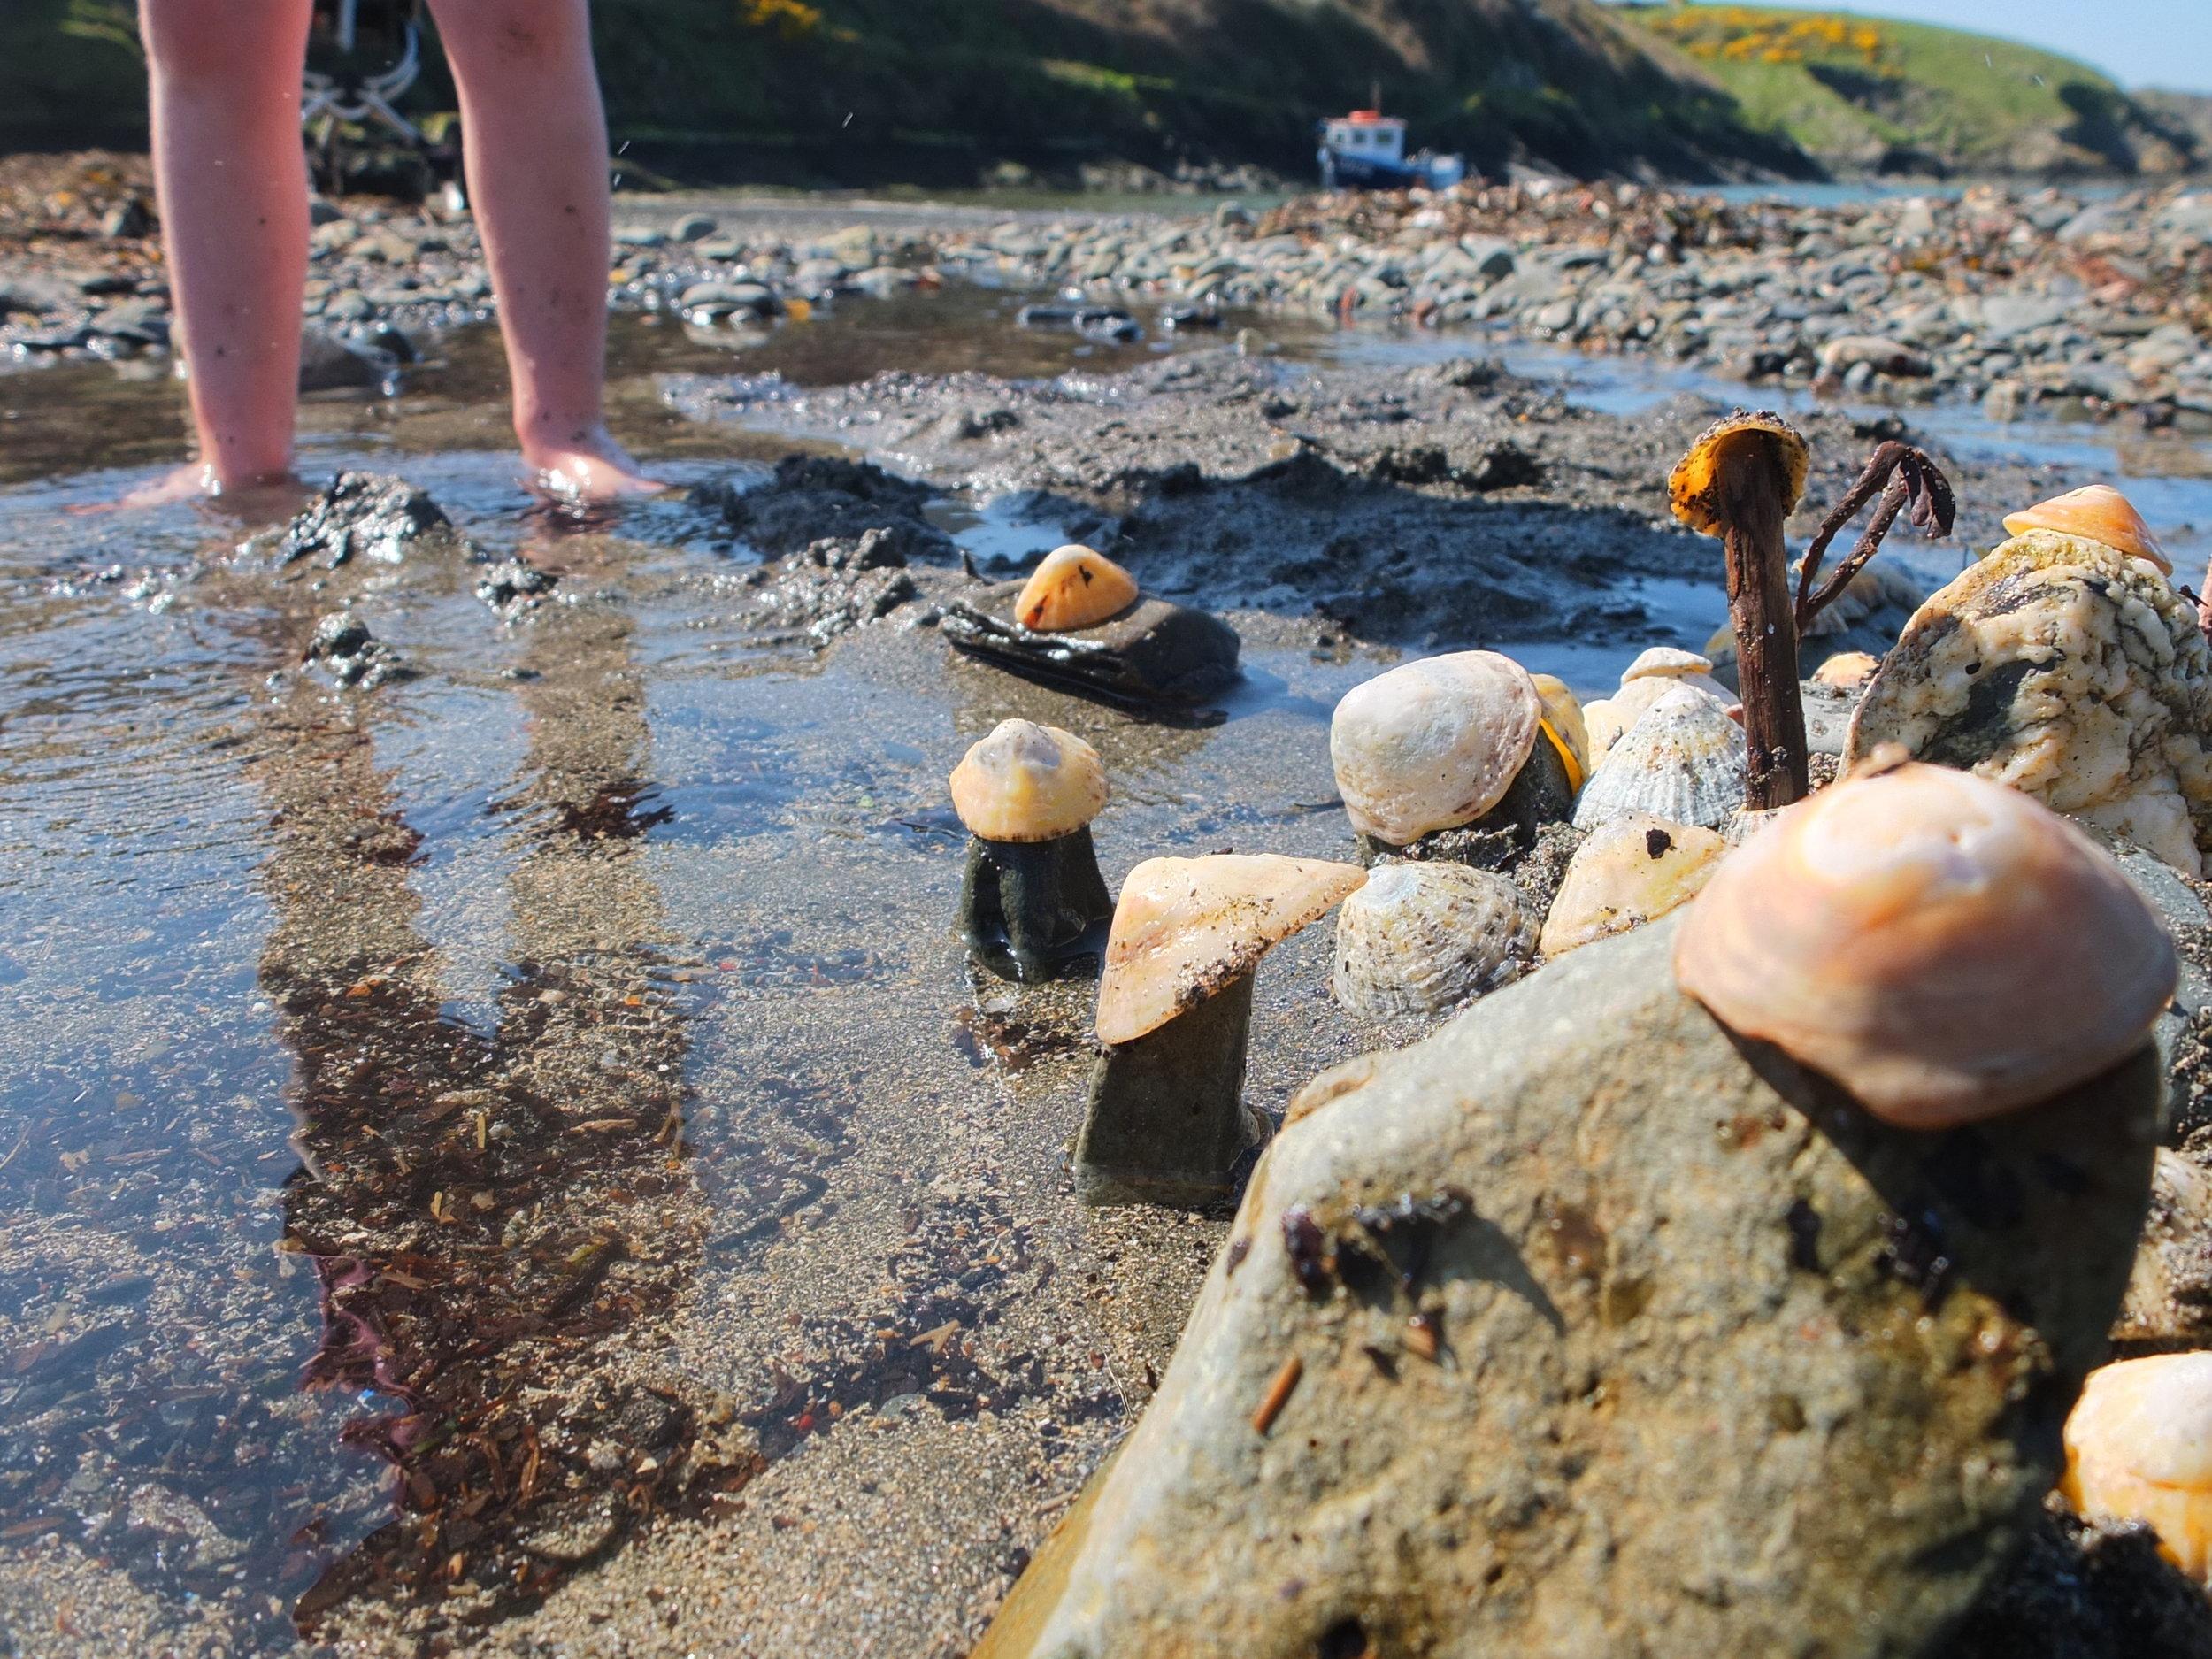 Shells and rock pools